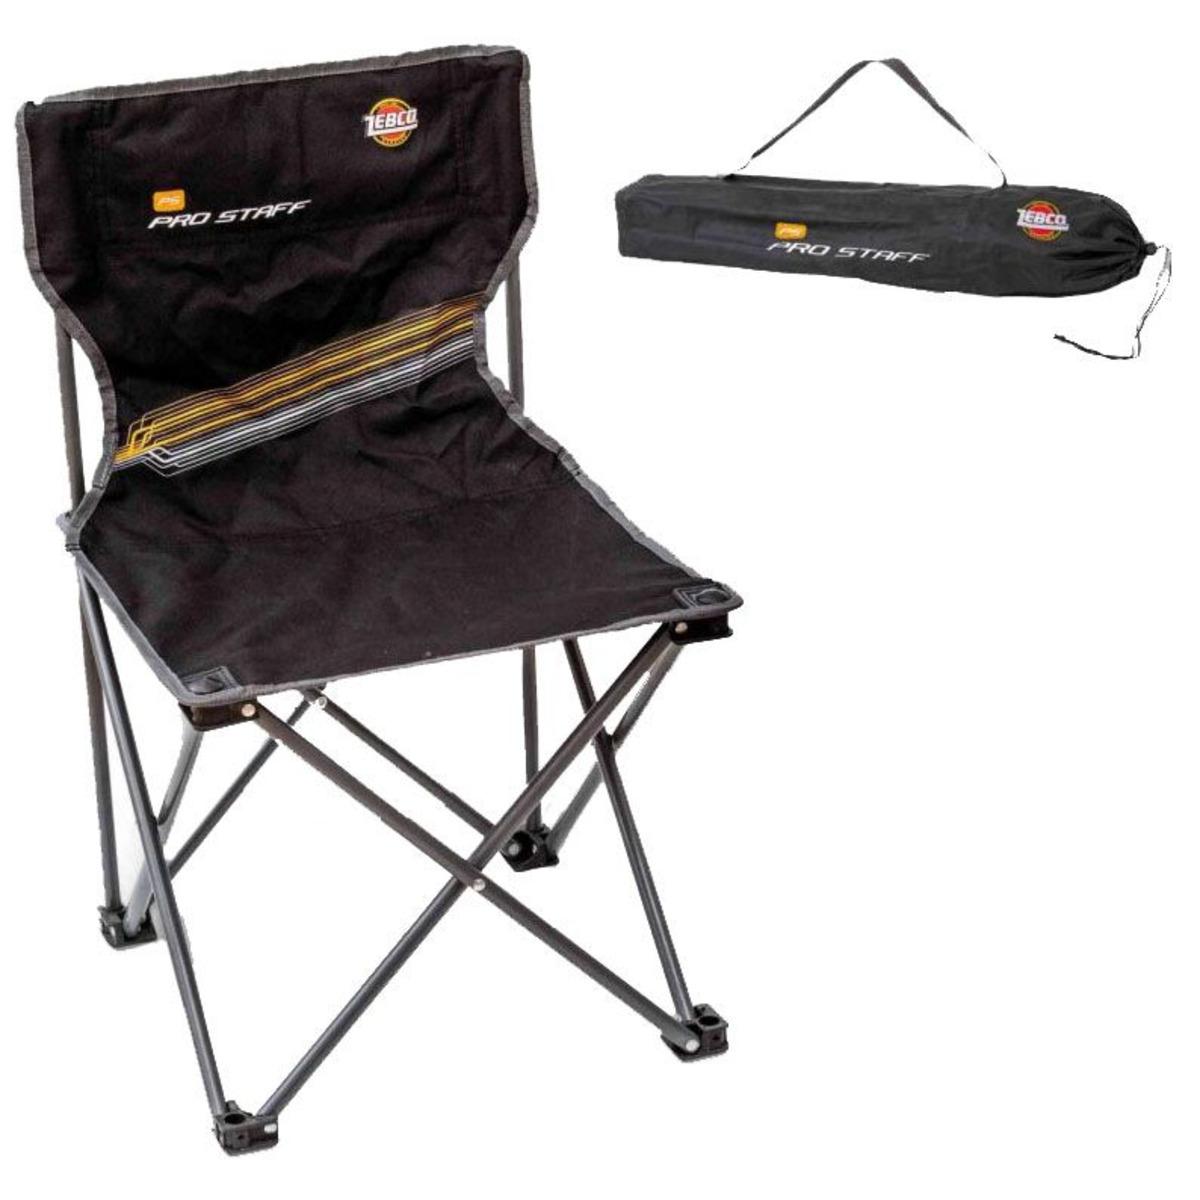 Zebco Pro Staff Chair Mini - 34x32x37 cm